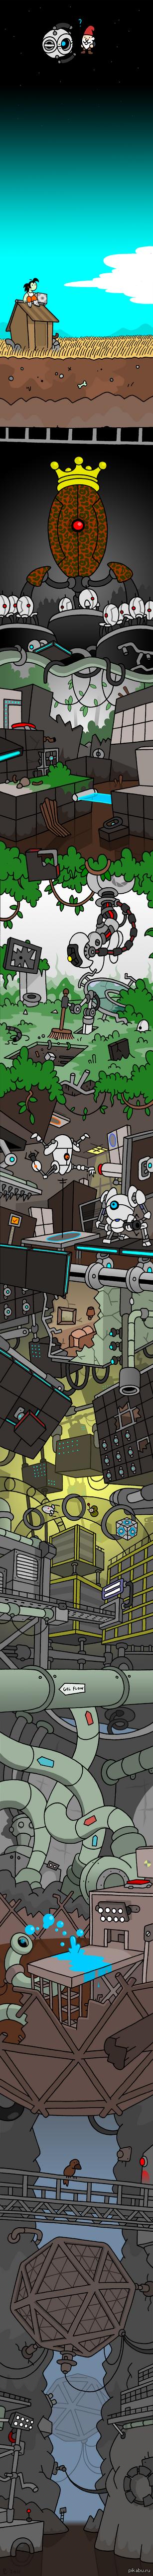 ���� ������2 � 1 ��������.   portal, ������� ��������, ����, �������, ����������